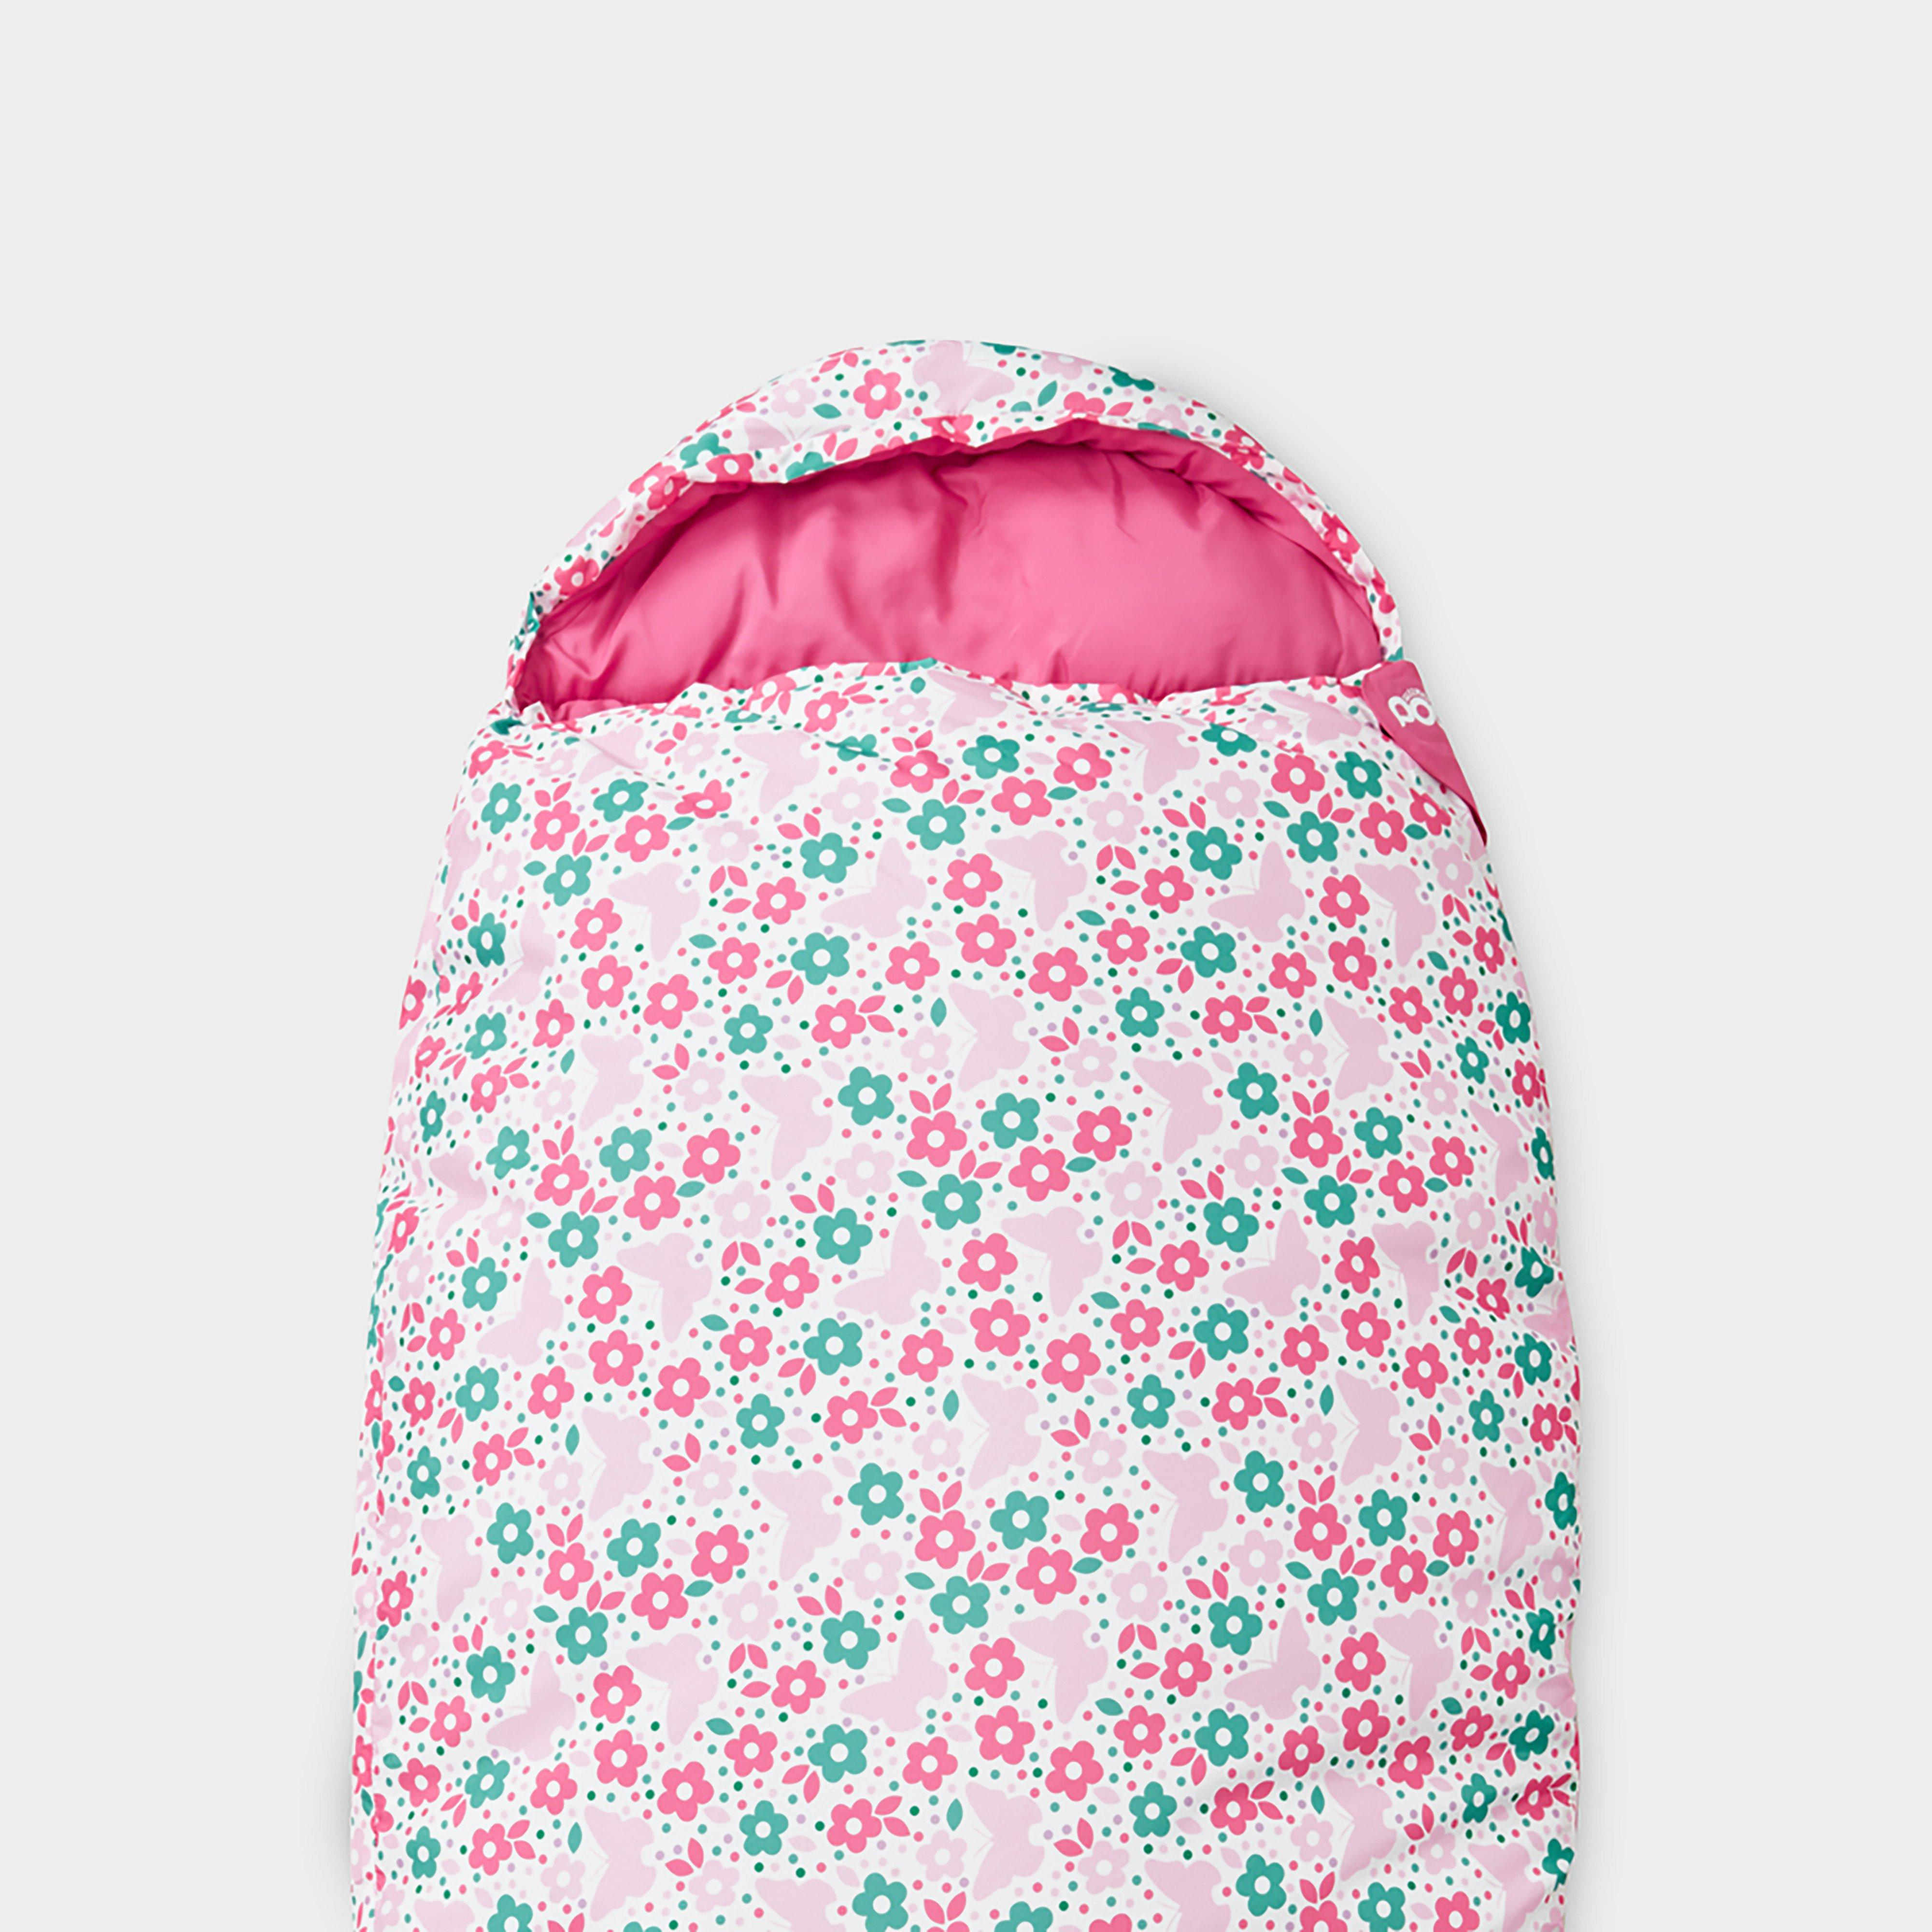 Pod Kids' Sleeping Pod  Flower - Pink/Wht, Pink/WHT